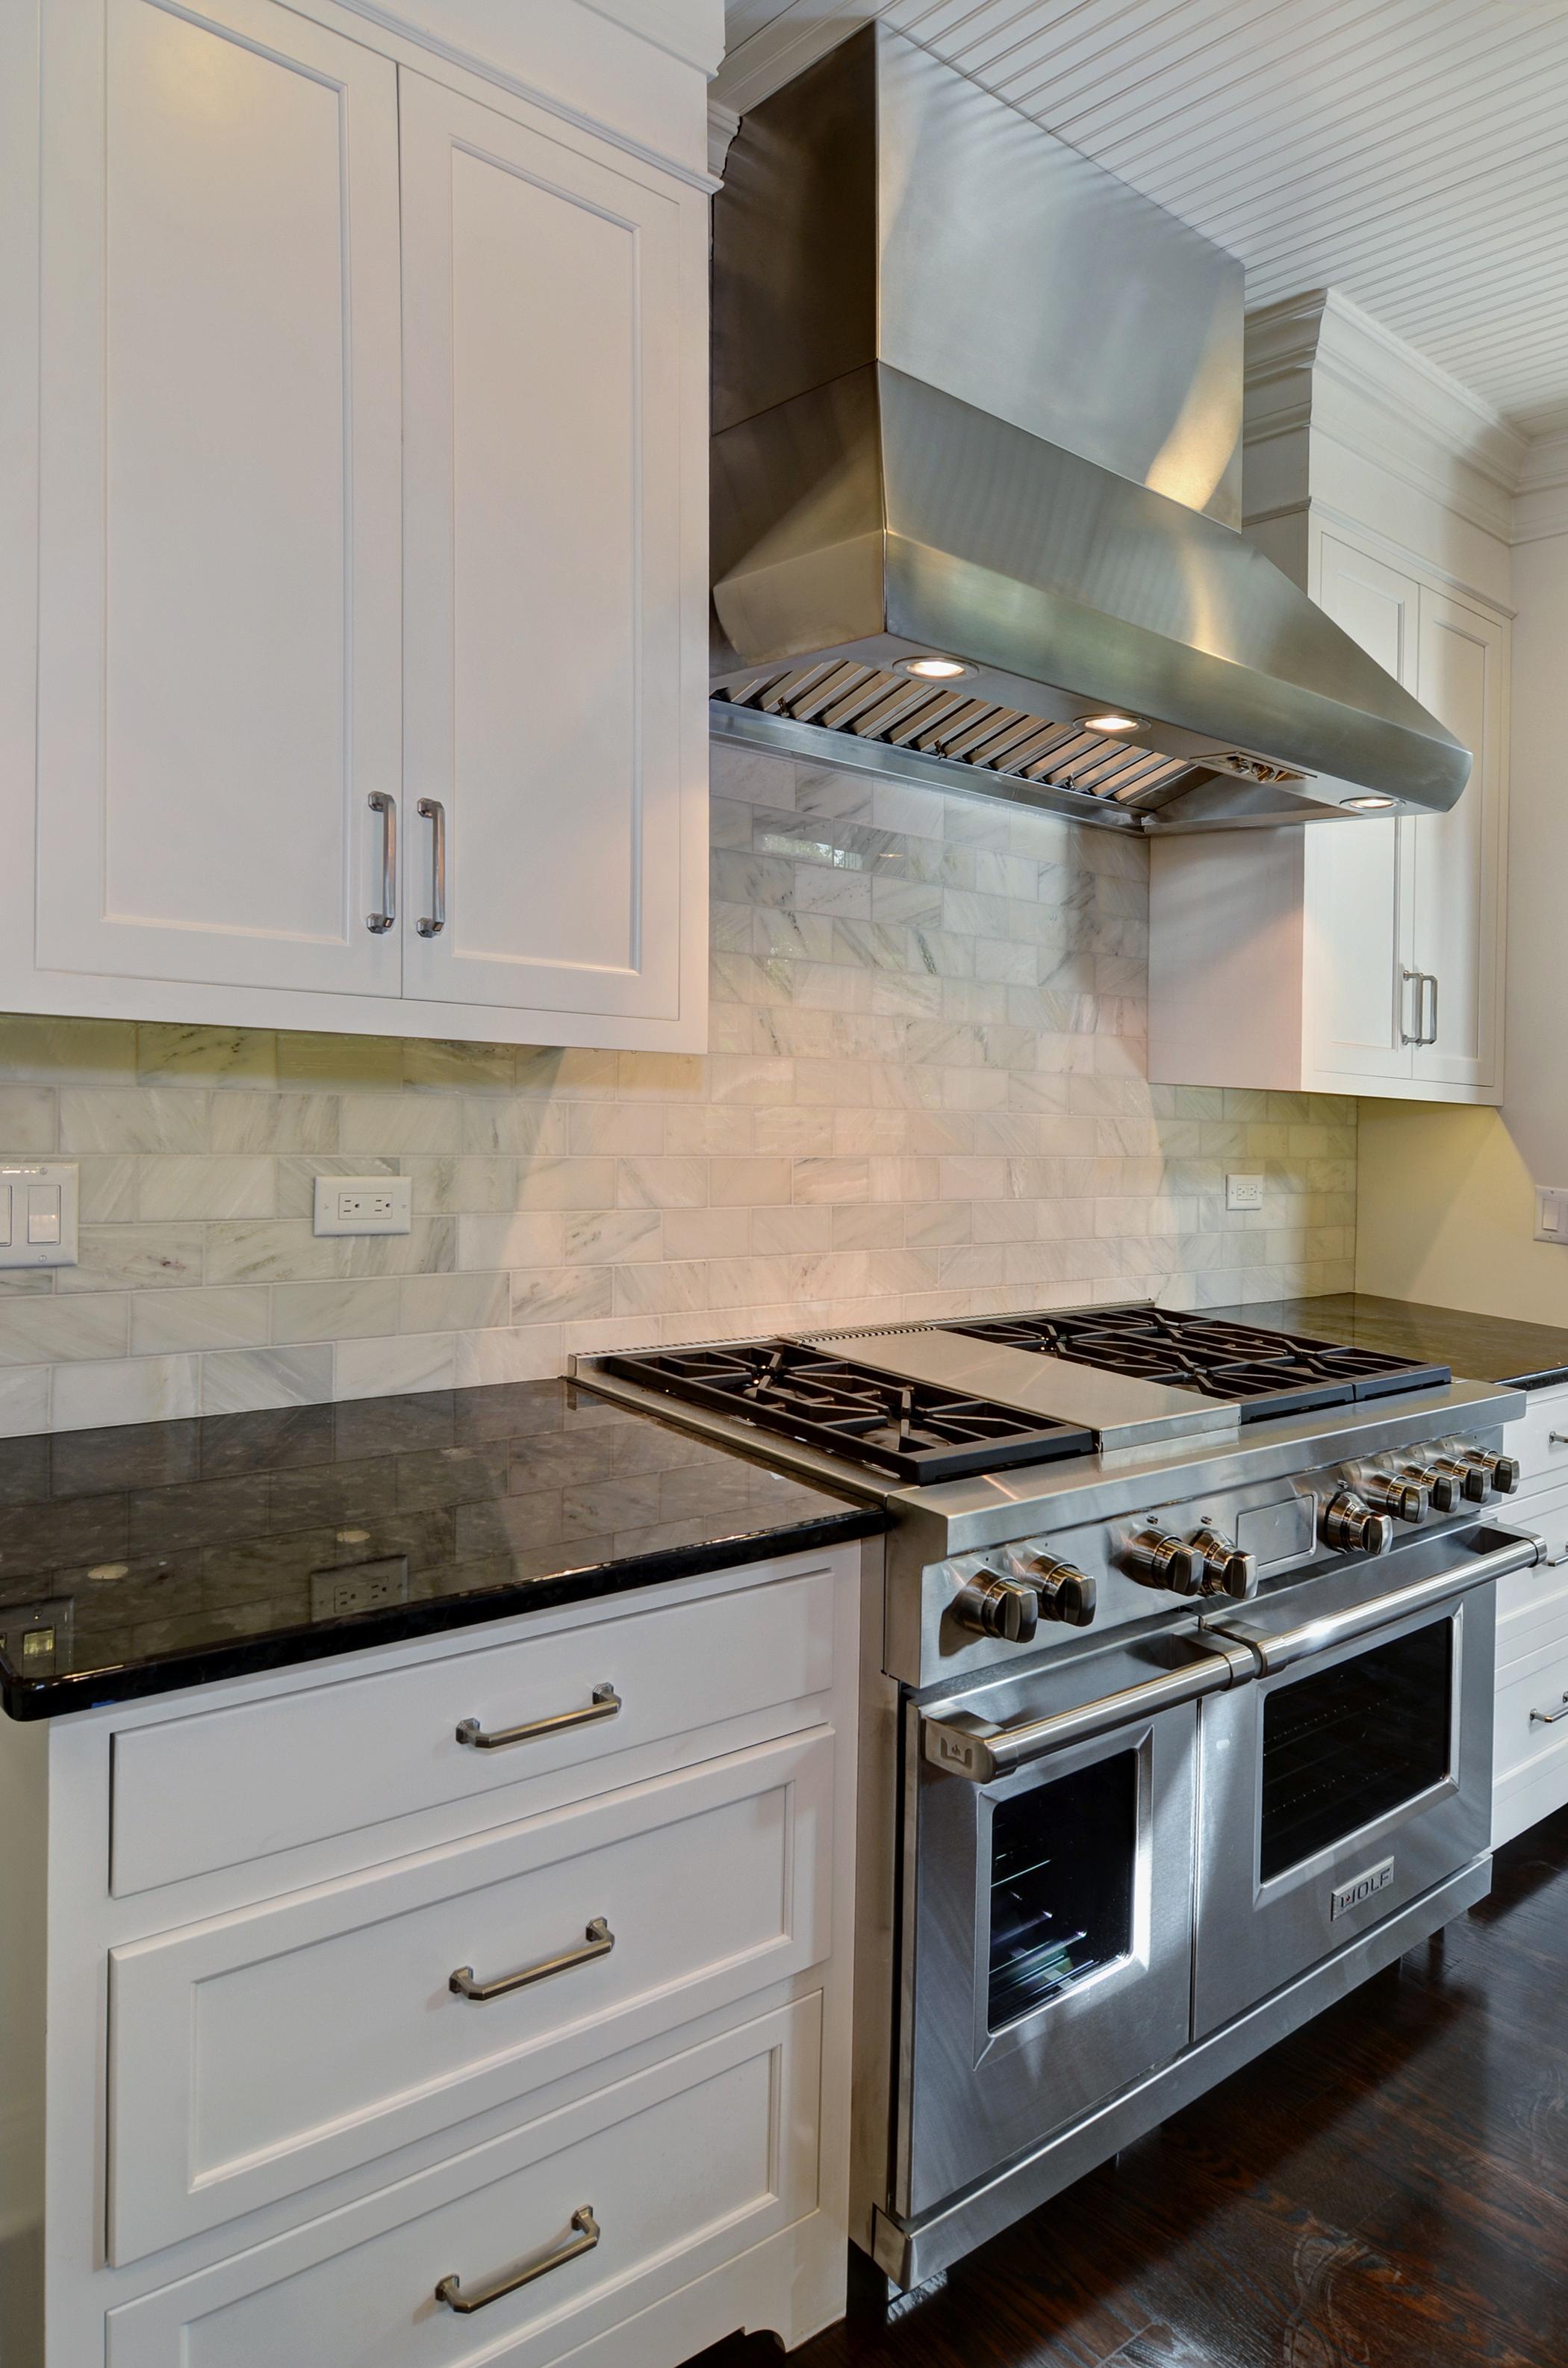 Rite-Way Kitchen Range and Hood